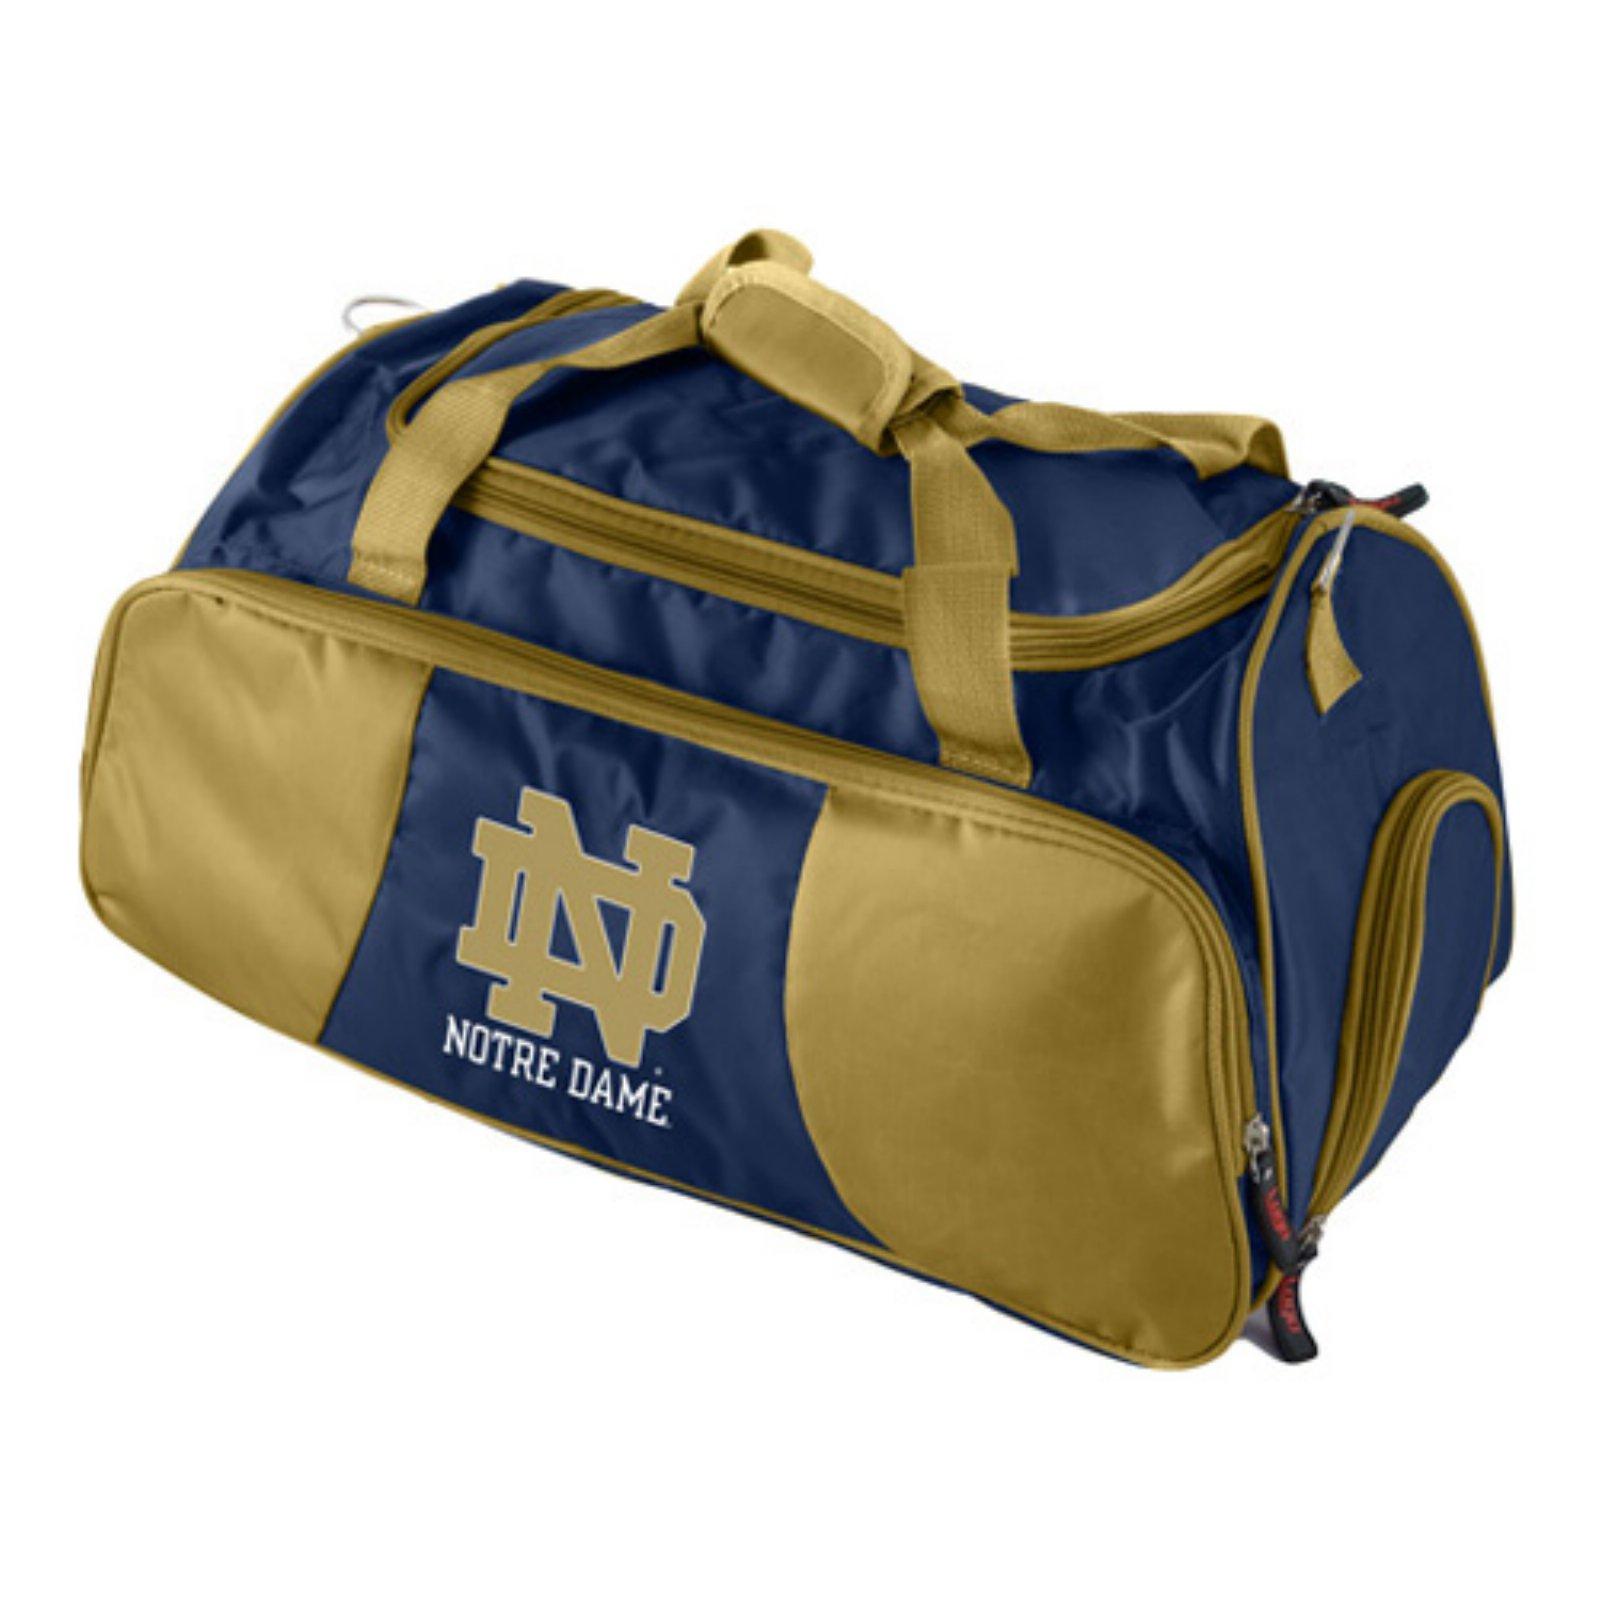 Gym Bag Walmart: Logo Chair NCAA Gym Sports Bag